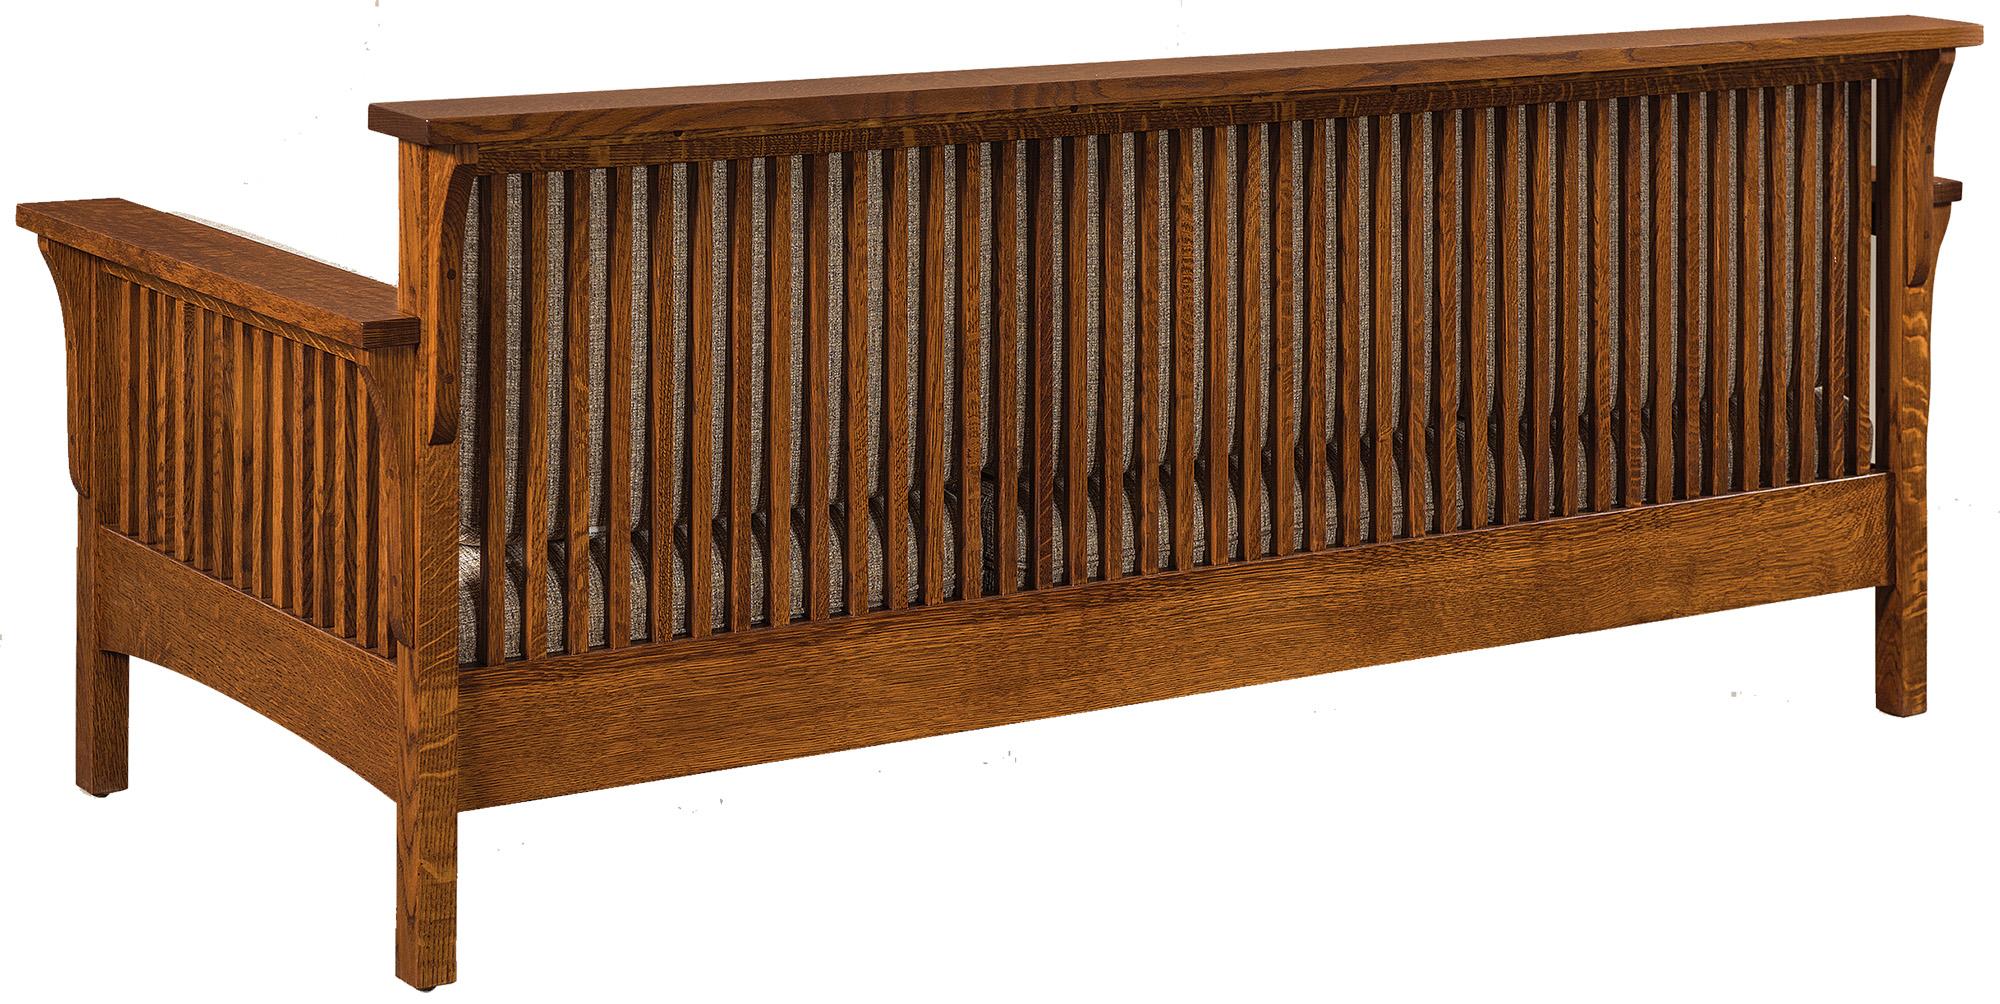 sofa bed timber slats roche bobois modular price highback slat wood mission